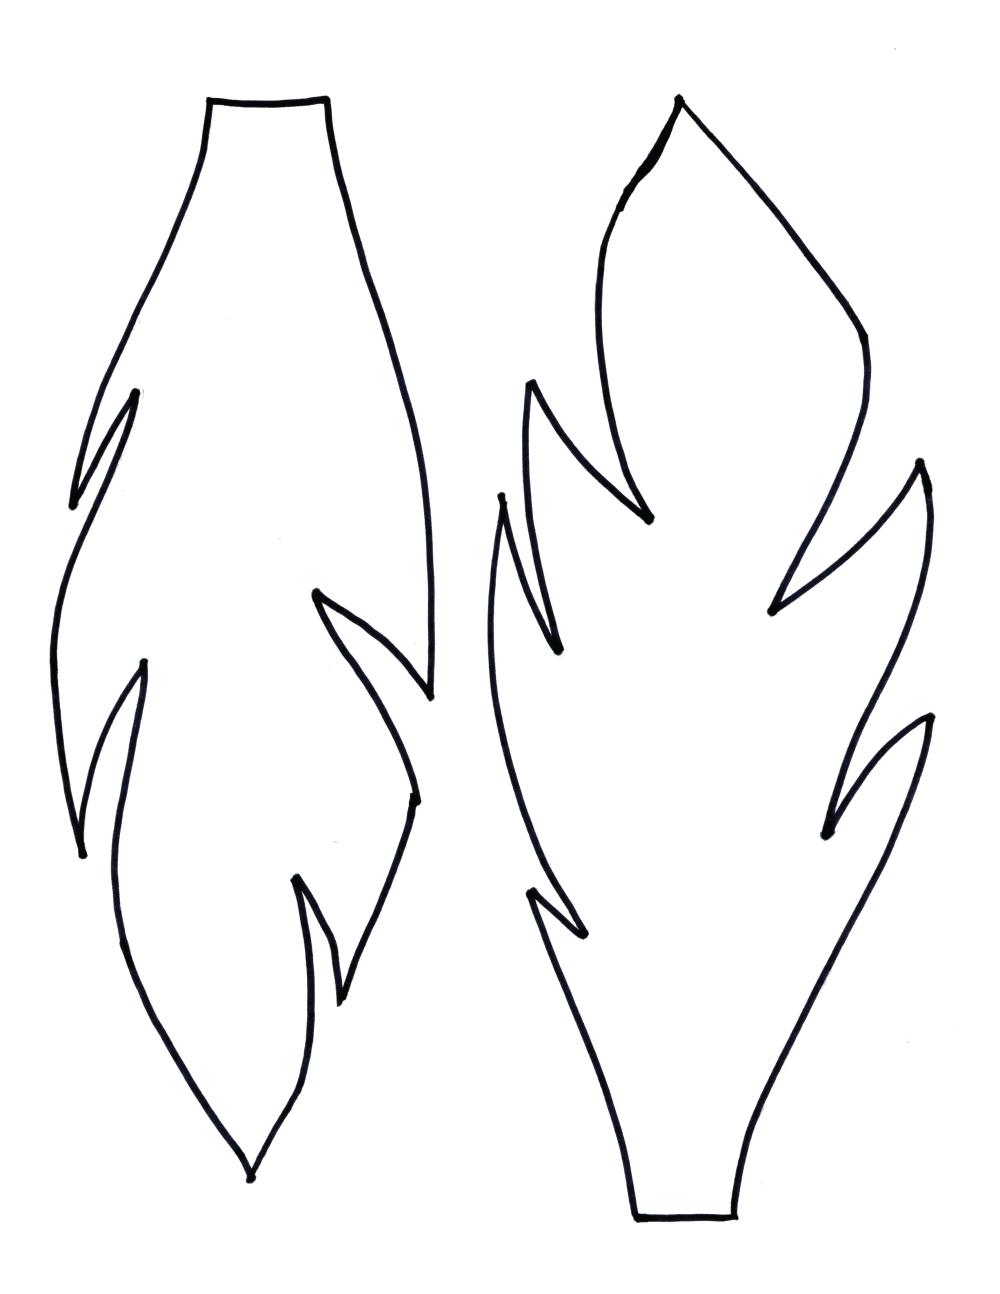 нарисованный лист одуванчика